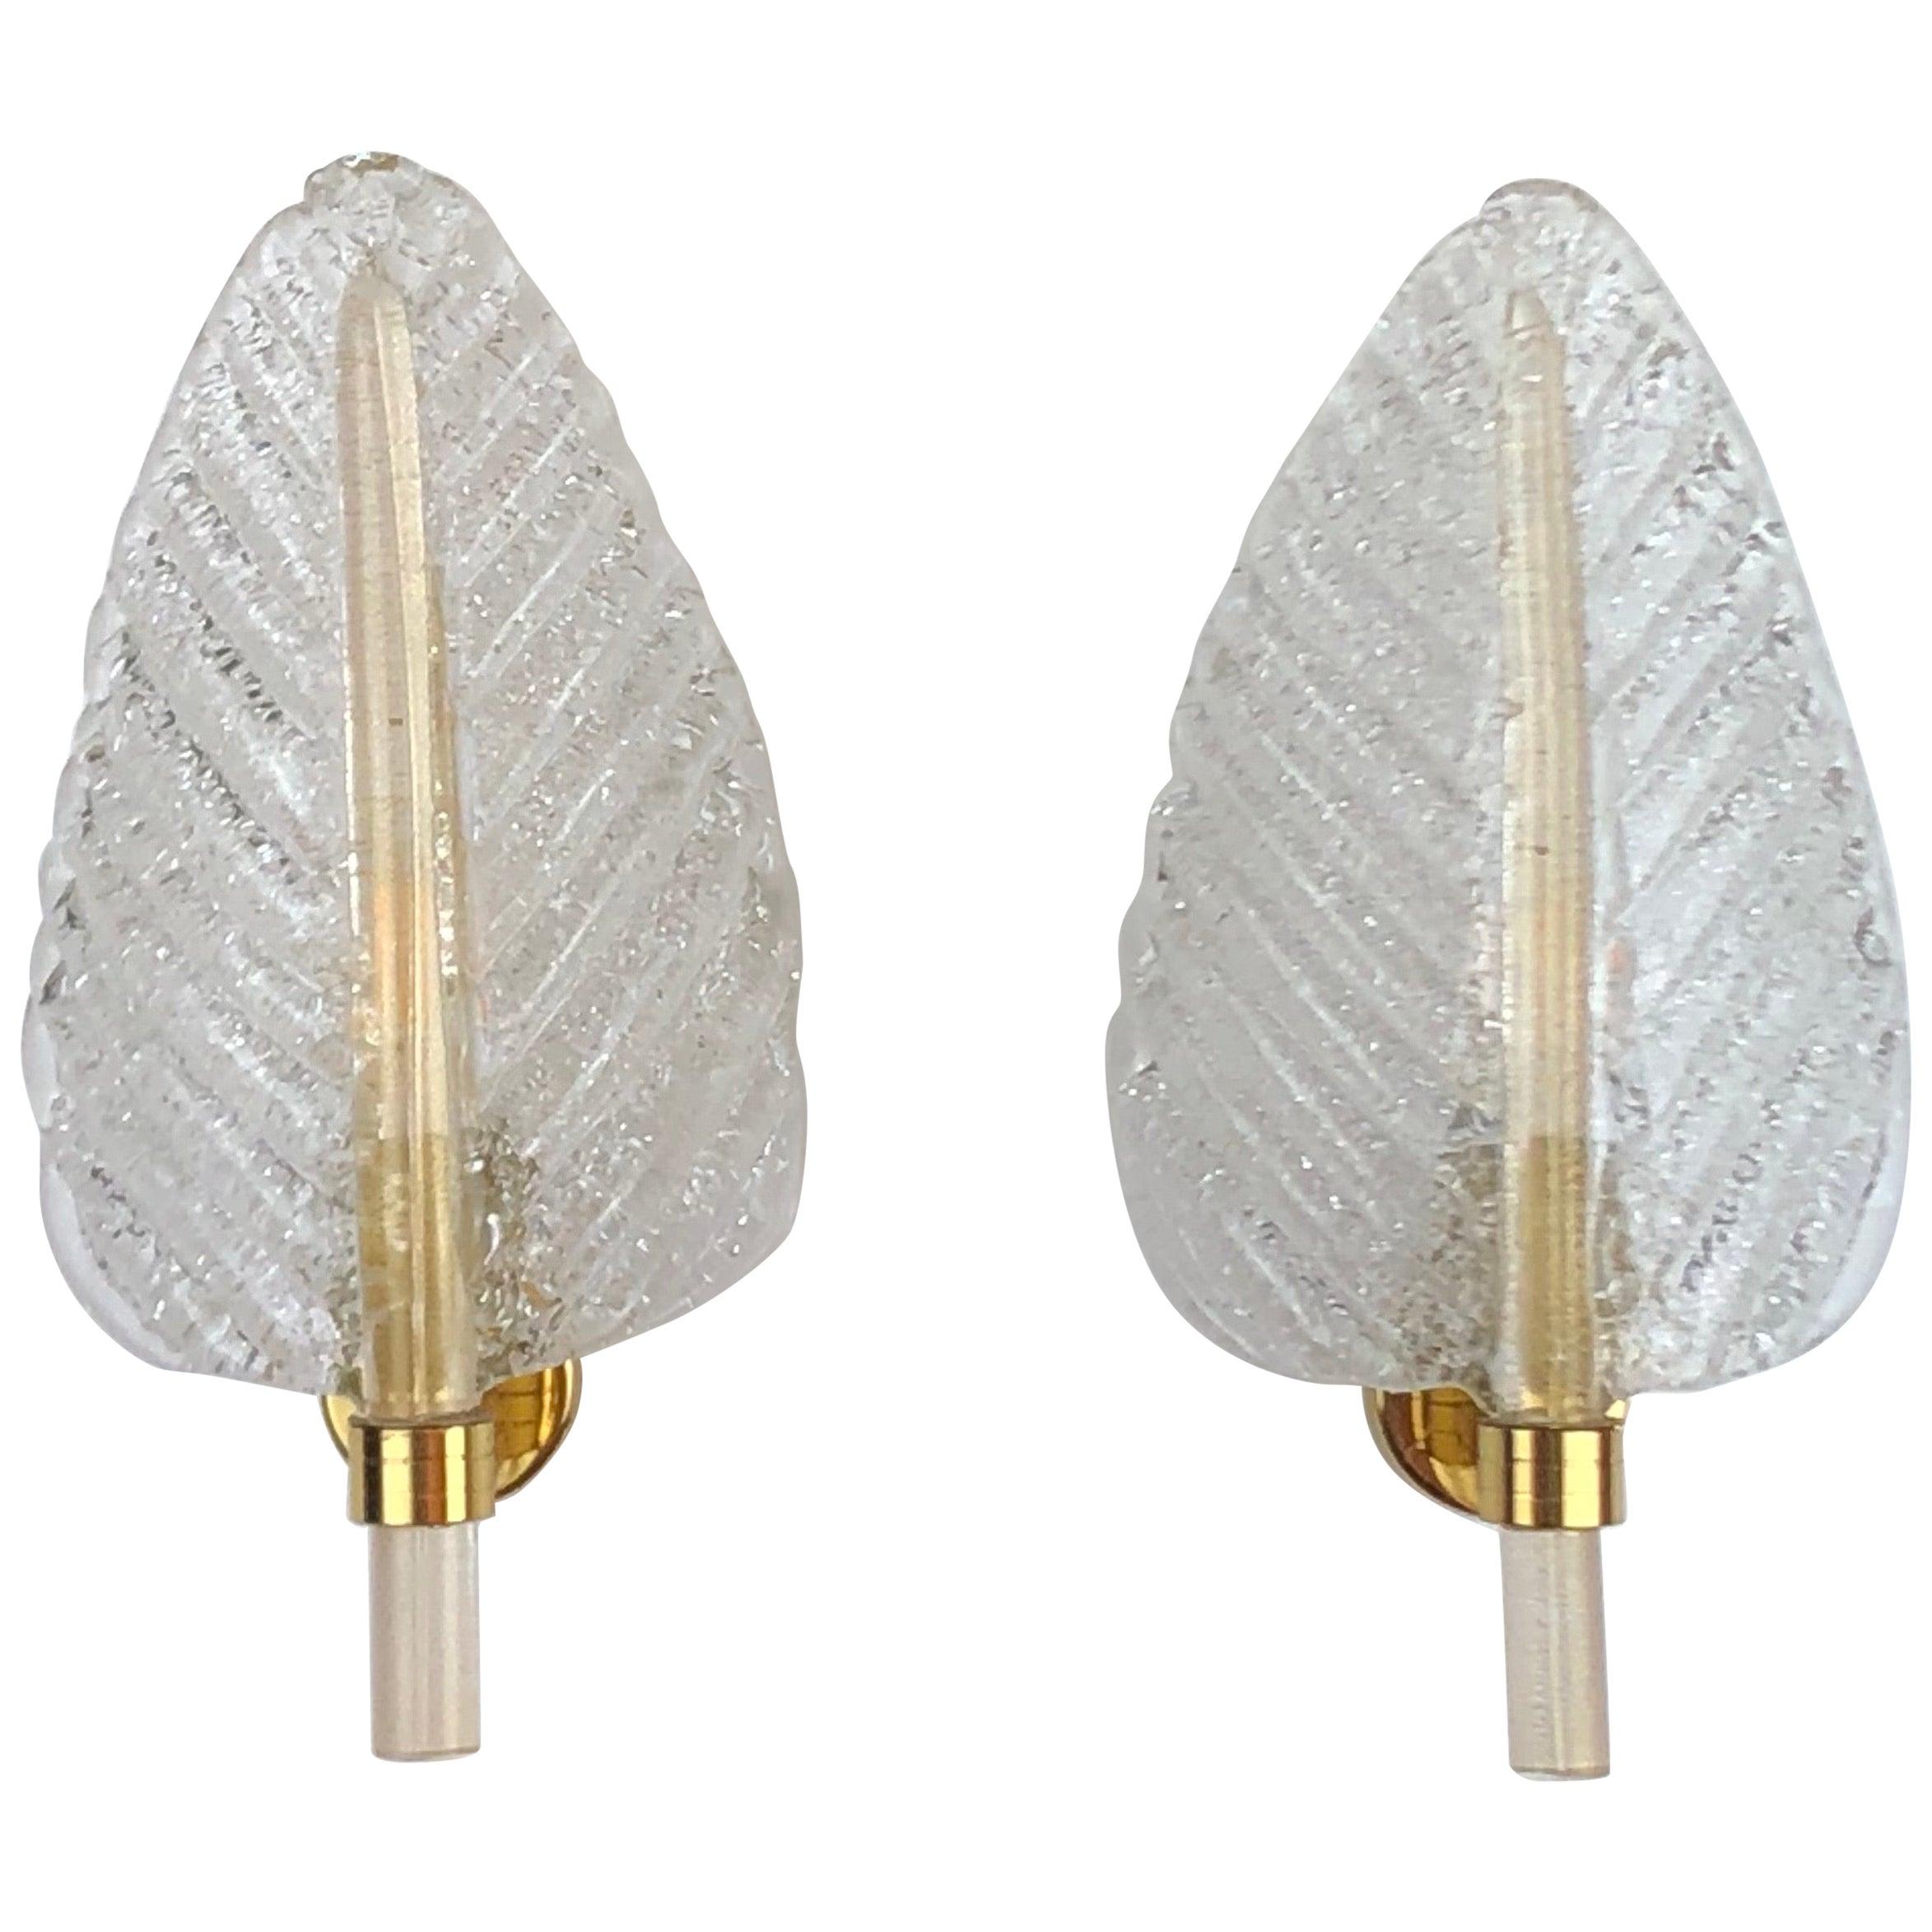 Pair of Barovier e Toso Leaf Murano Glass Wall Sconces, circa 1960s